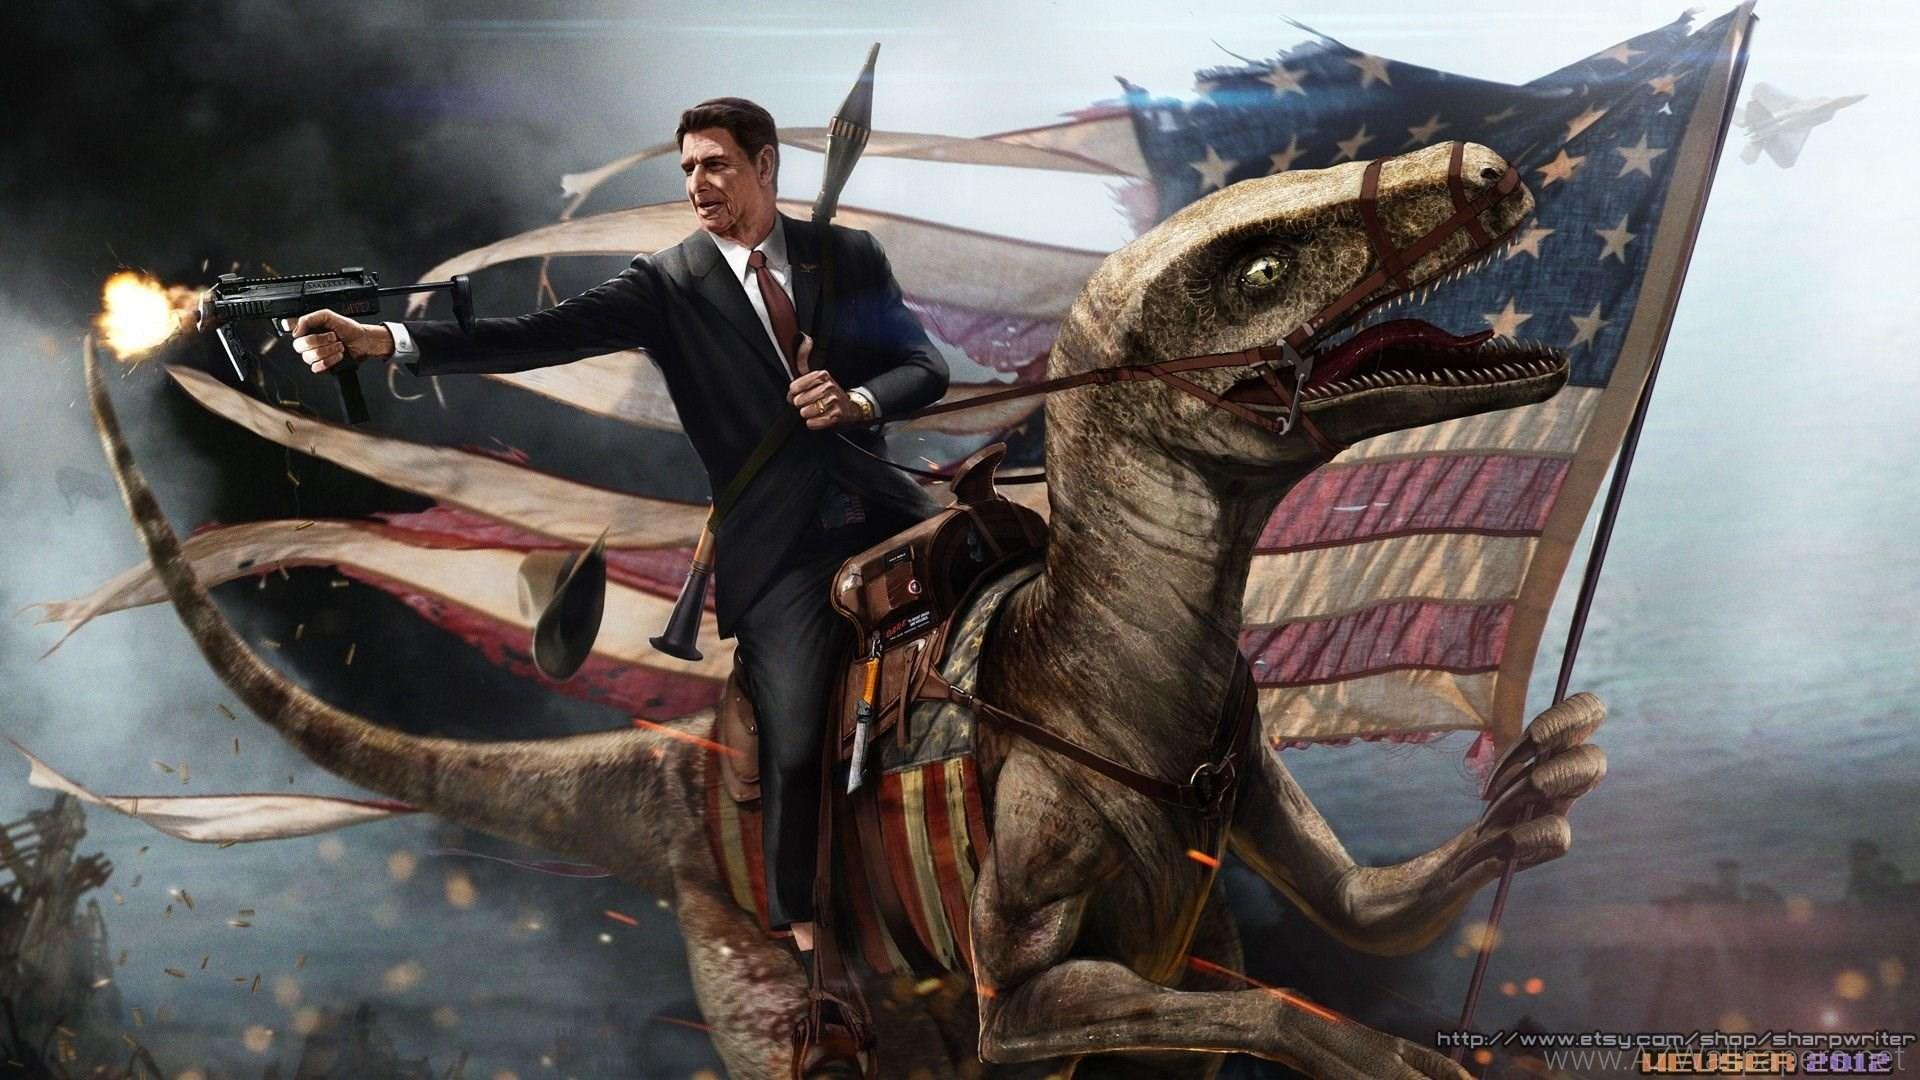 7 Badass Digital Art Wallpapers Of United States Presidents .